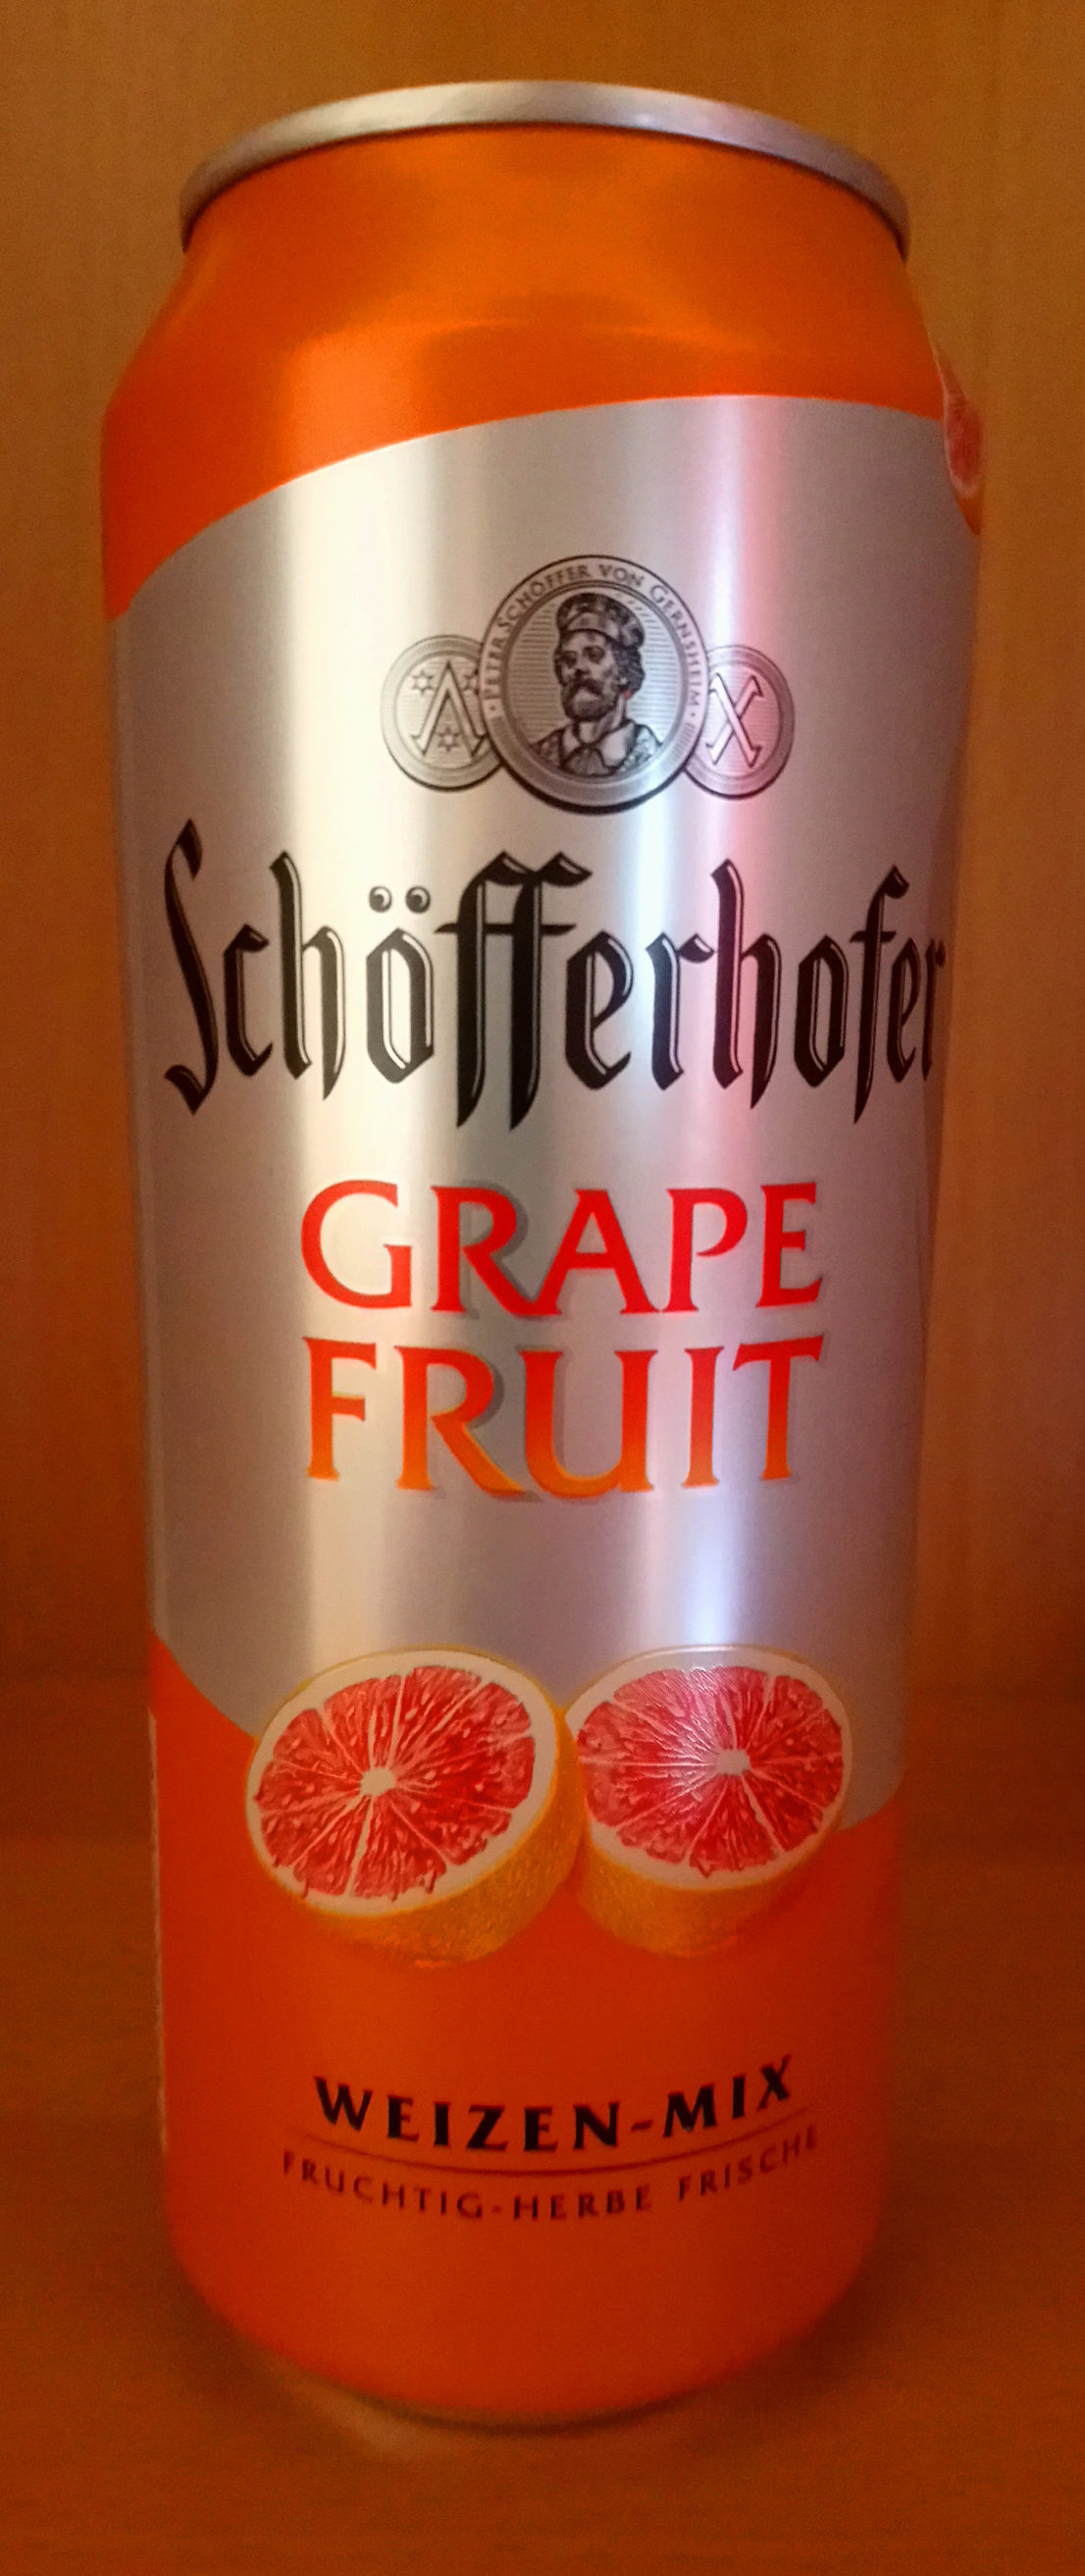 Schöfferhofer Grape Fruit - Producto - de